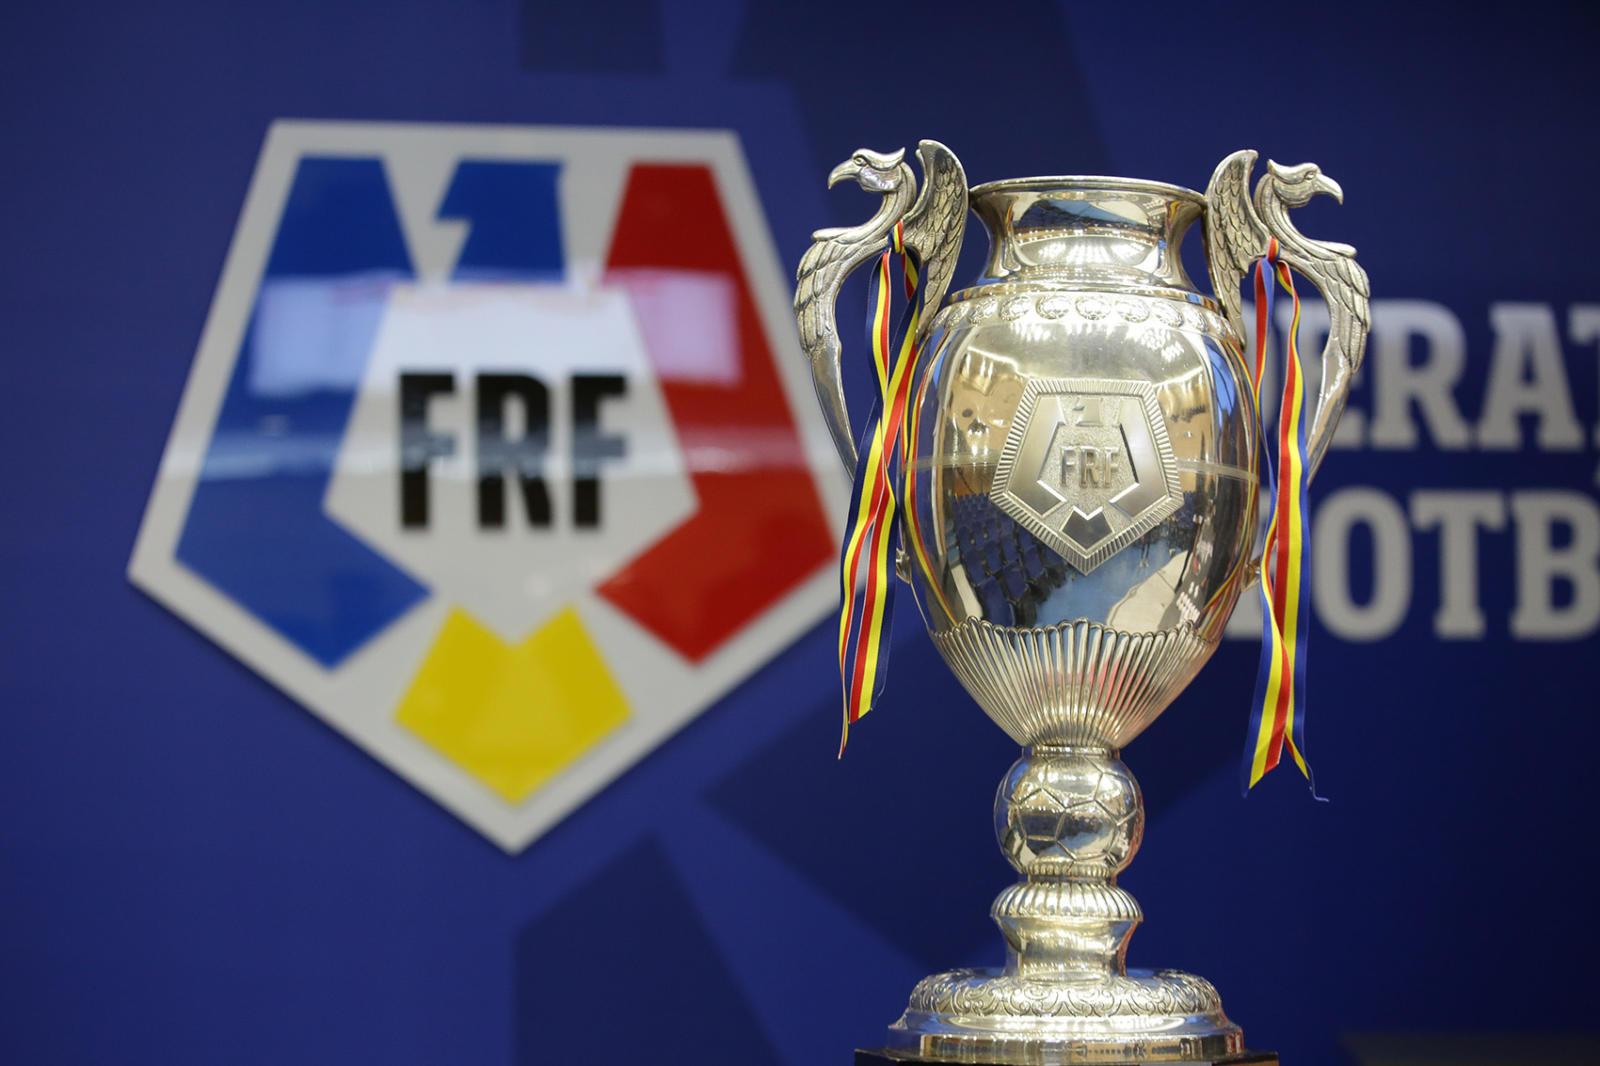 Cine transmite Cupa Romaniei. Dinamo - FCSB se vede și online live stream Cupa României